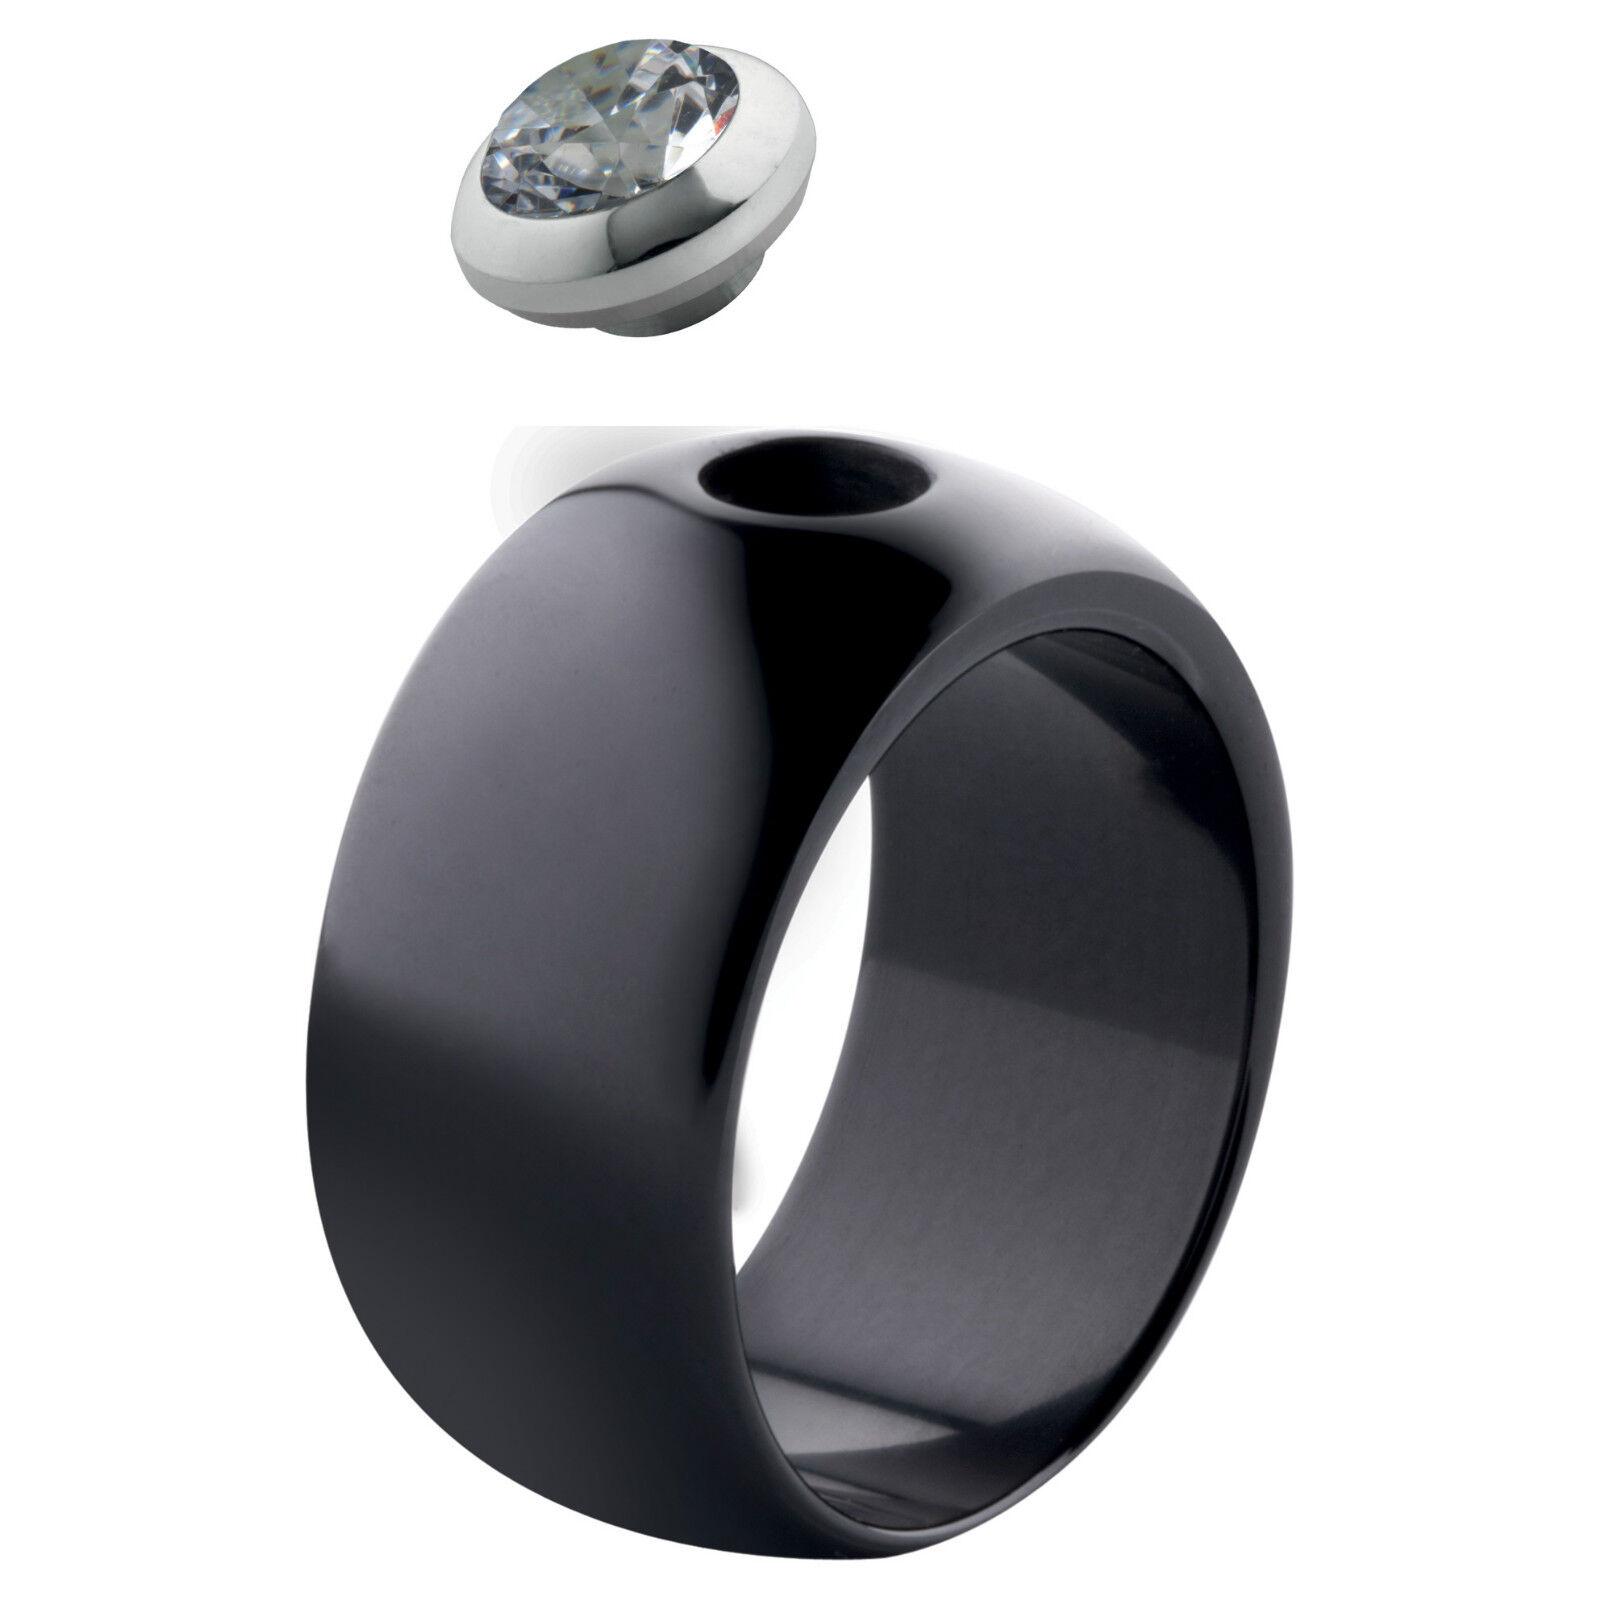 MelanO Magnetic Ring Keramik 10 mm breit Größe 50 black M 01R005 BL ohne Kopf